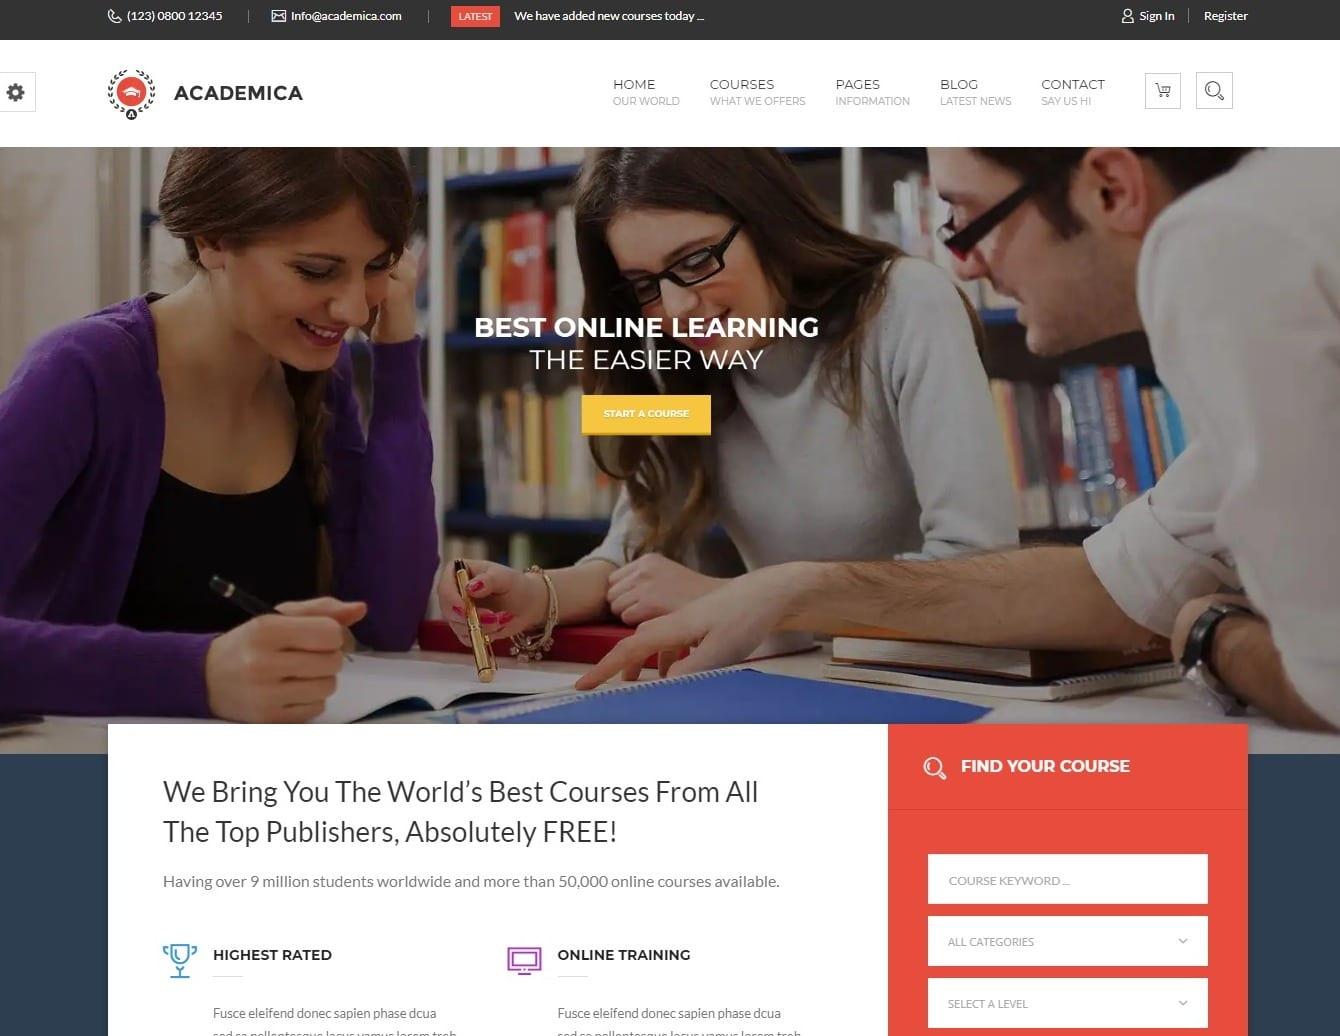 academica-education-website-template